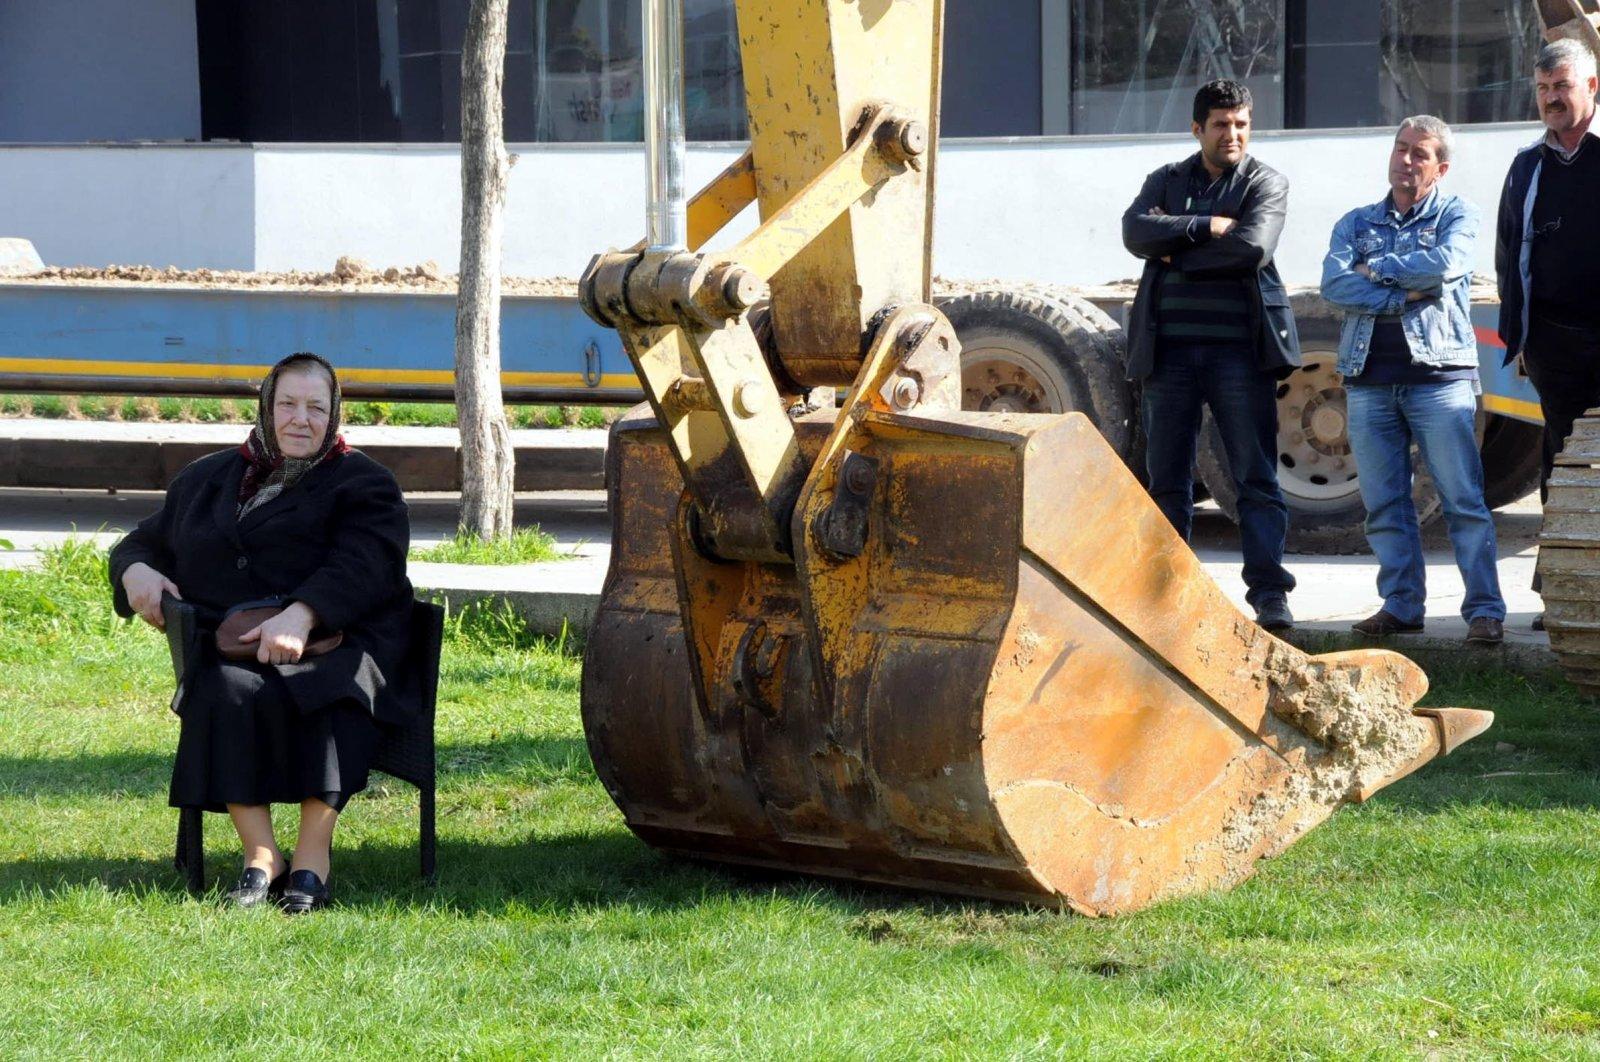 Kıymet Peker sits in front of a bulldozer, in Edirne, northwestern Turkey, March 31, 2014. (DHA PHOTO)